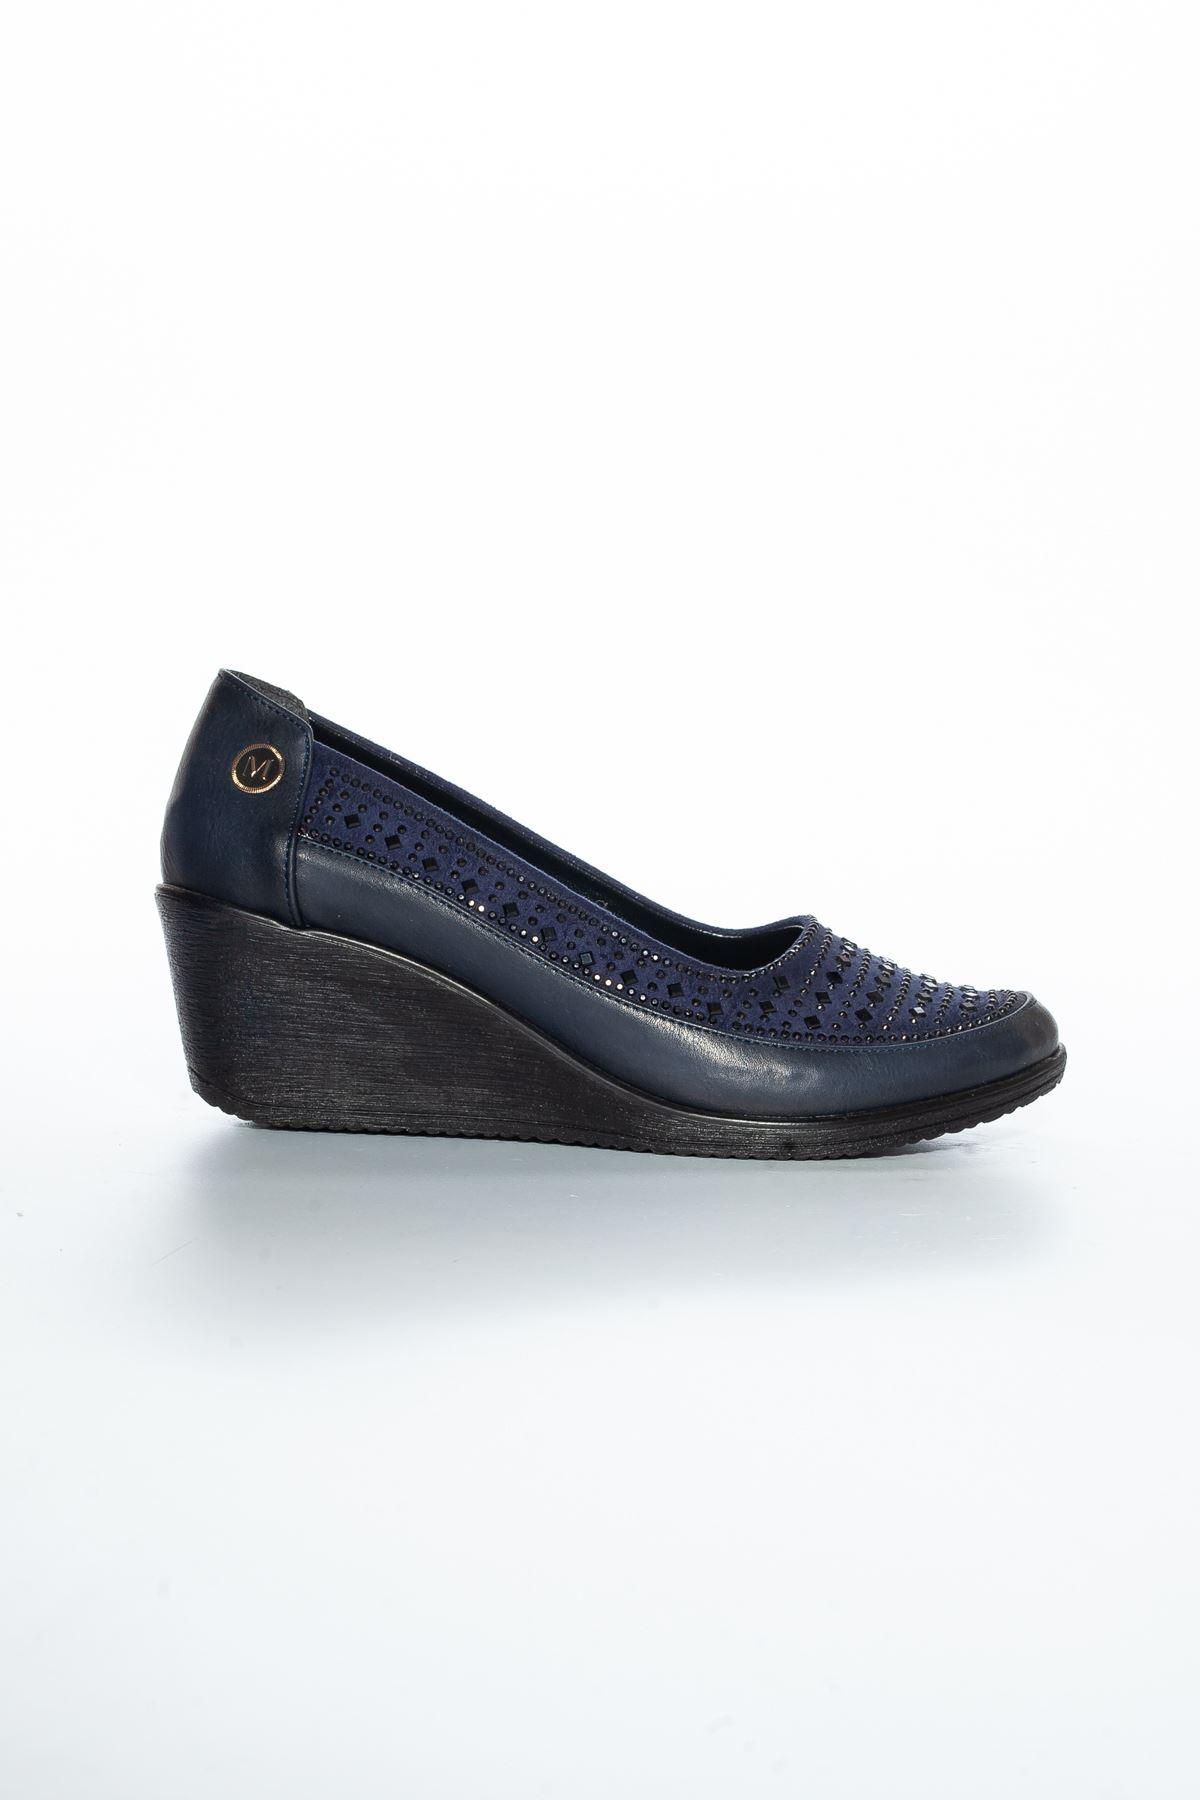 Alza Cilt Ayakkabı Lacivert